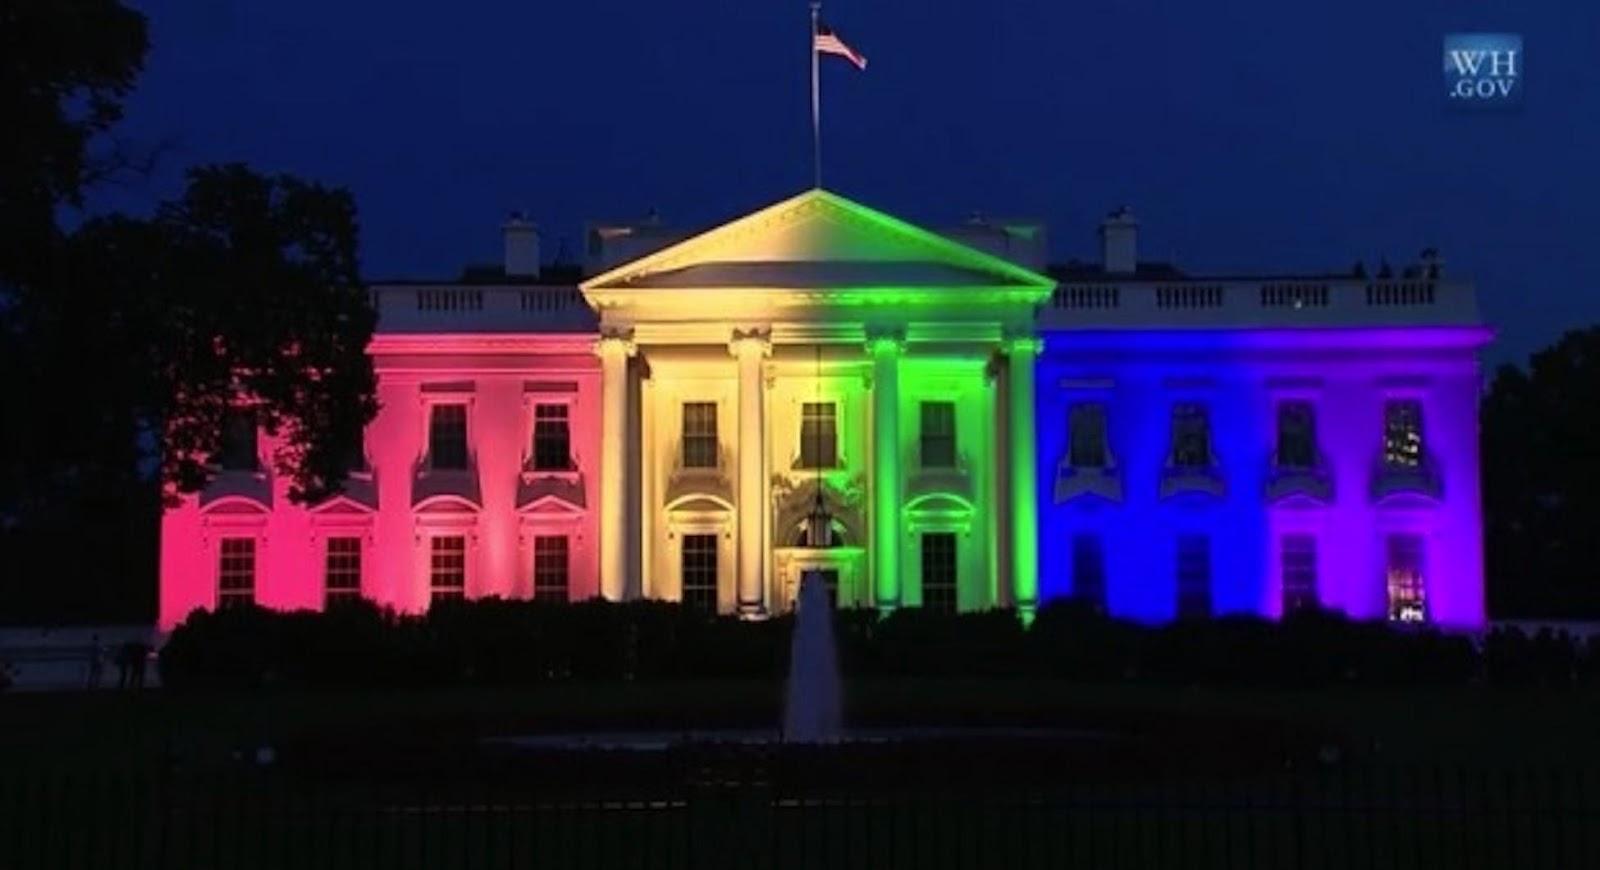 White House Rainbow Screen-Shot.jpg